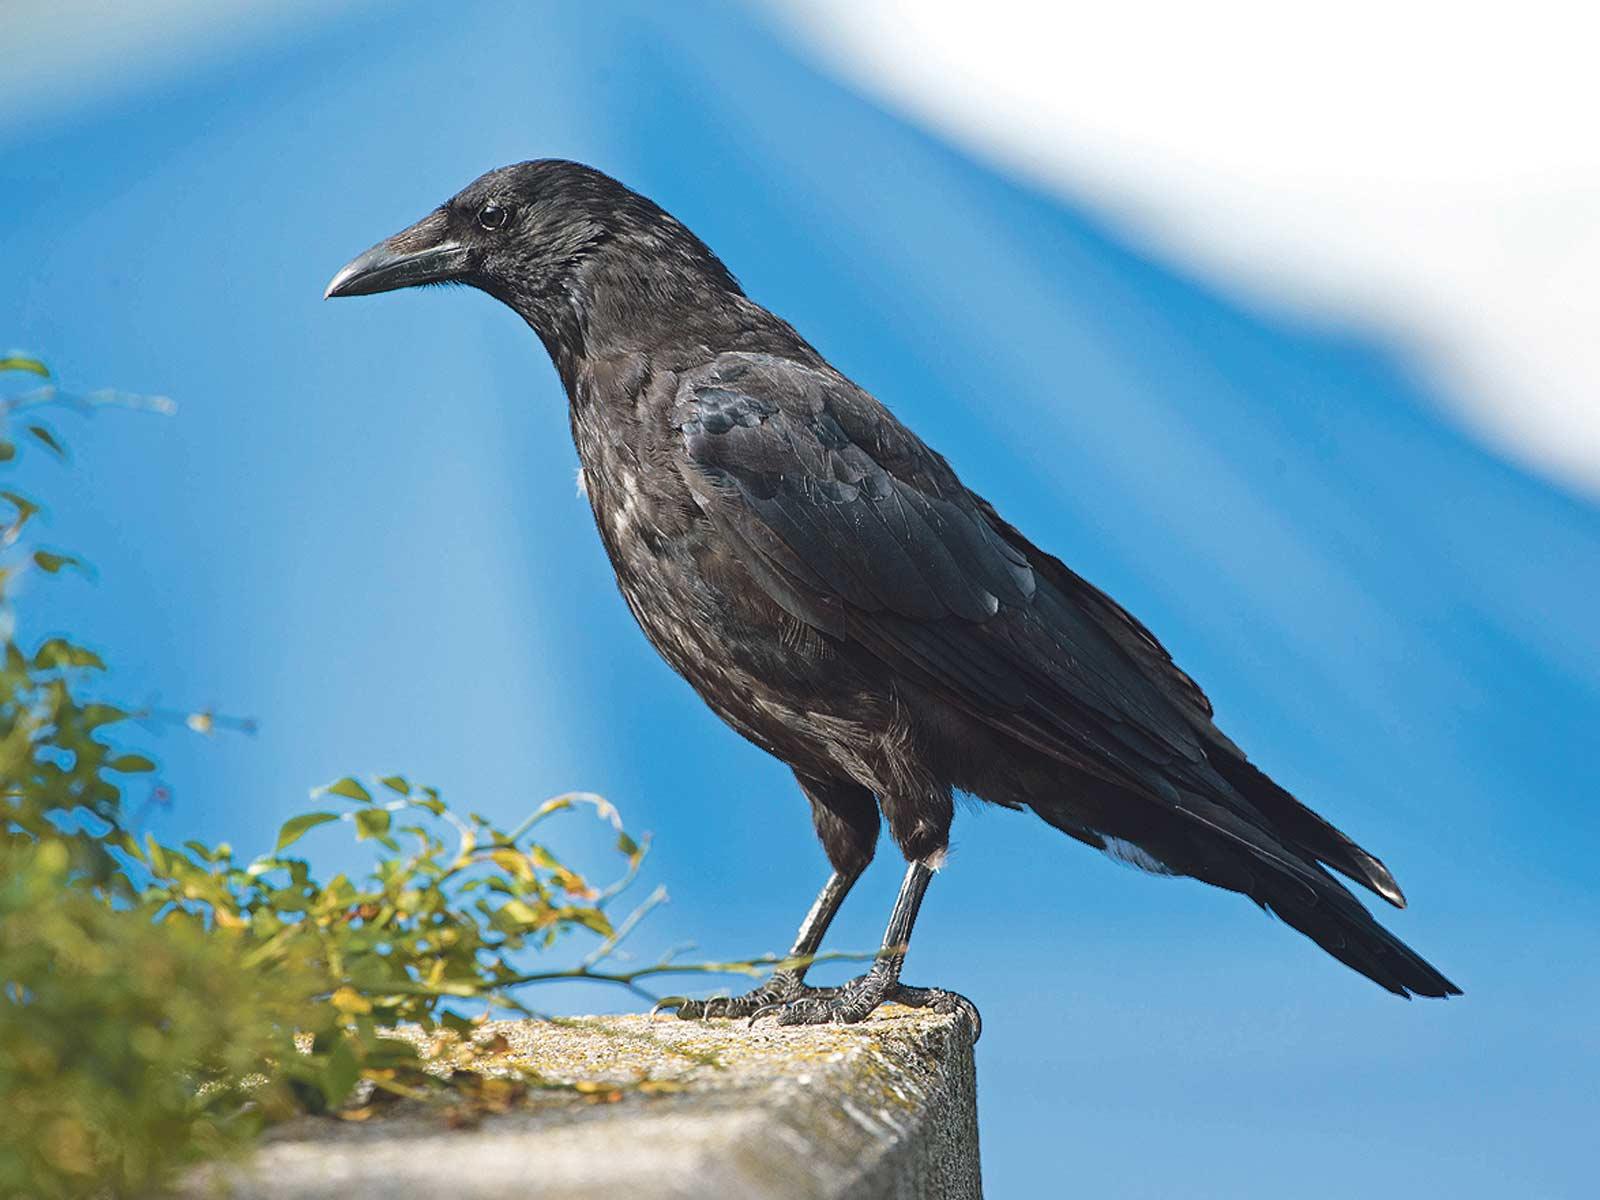 Rabenvögel